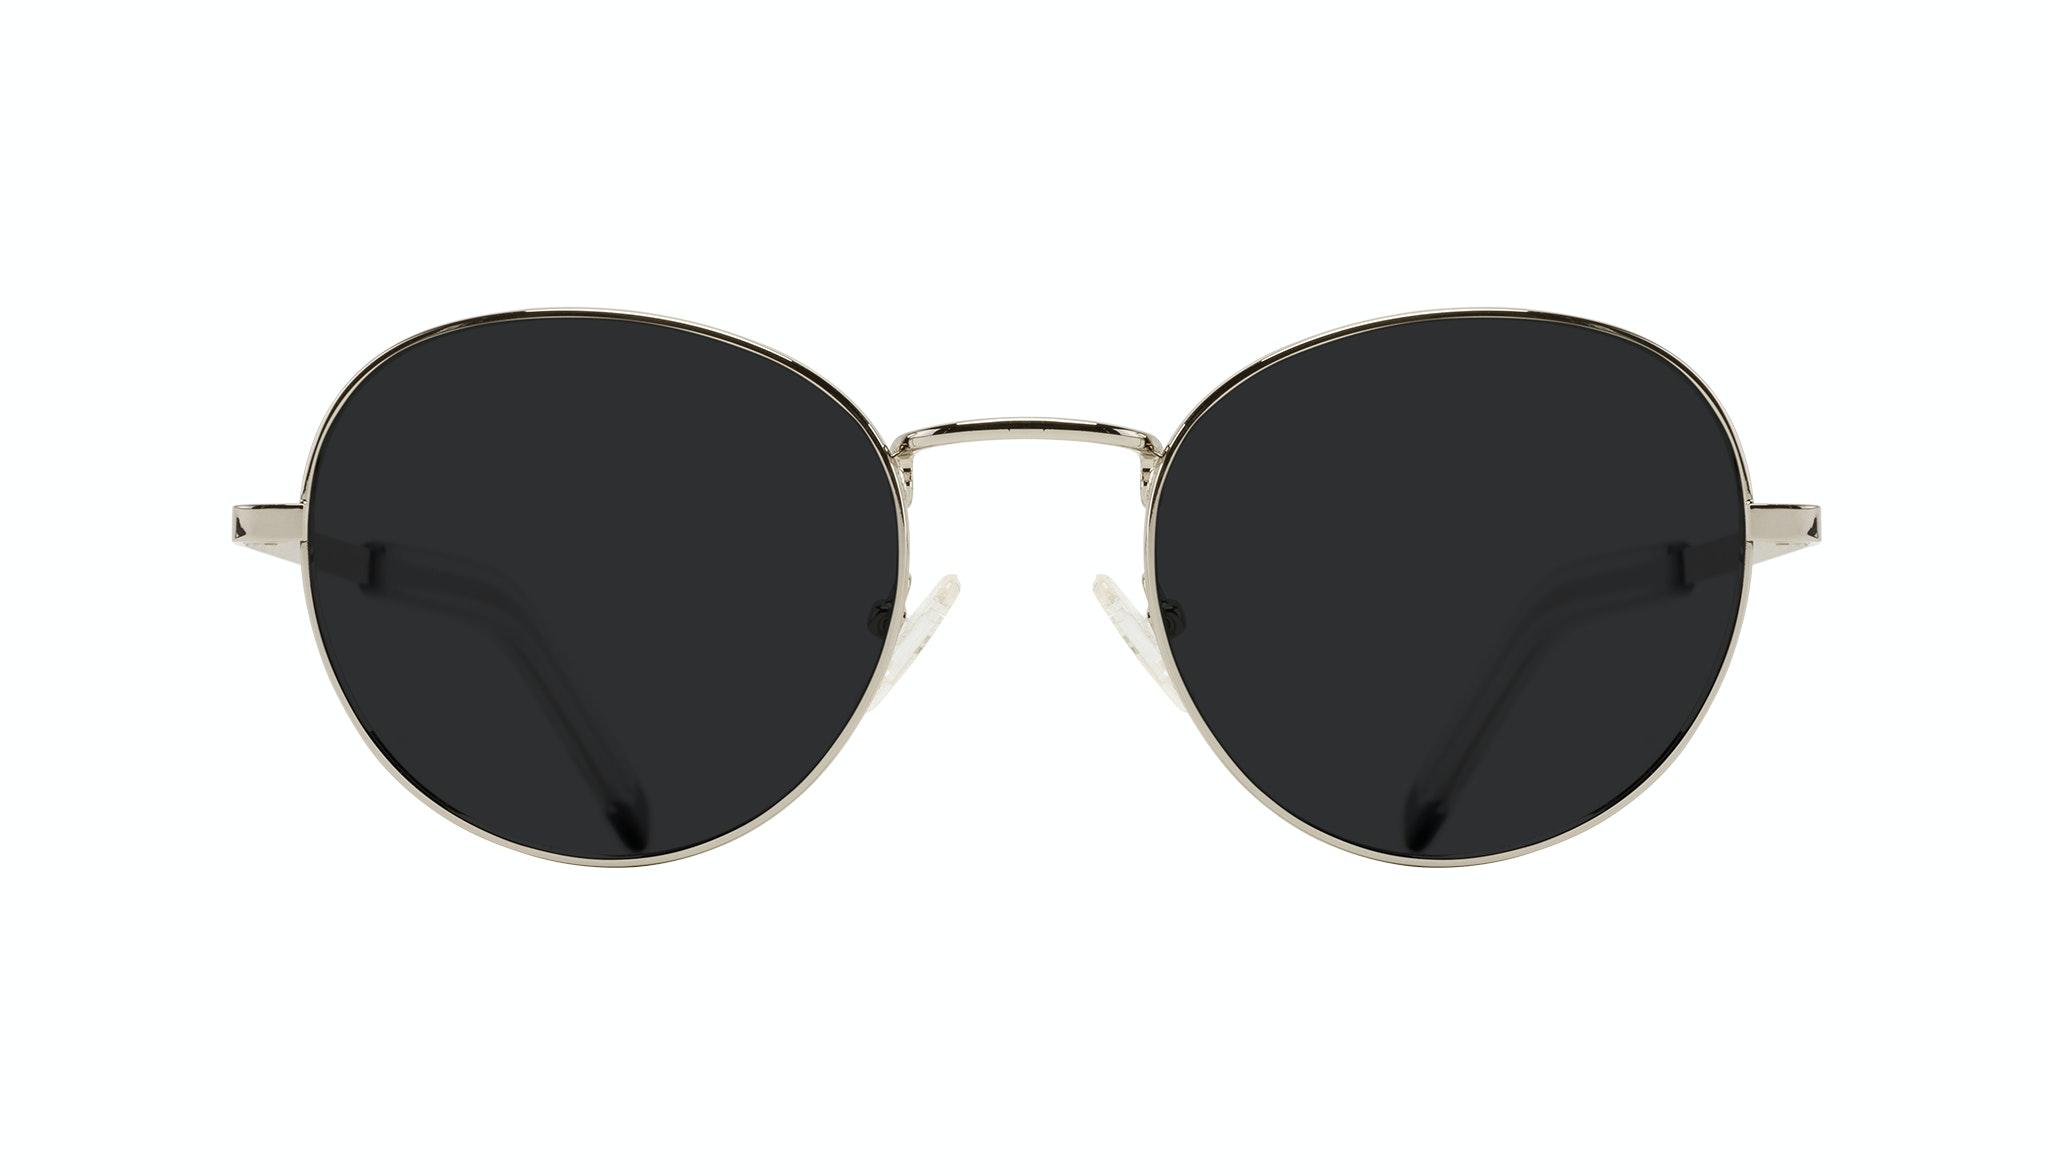 Affordable Fashion Glasses Round Sunglasses Men Lean XL Silver Front